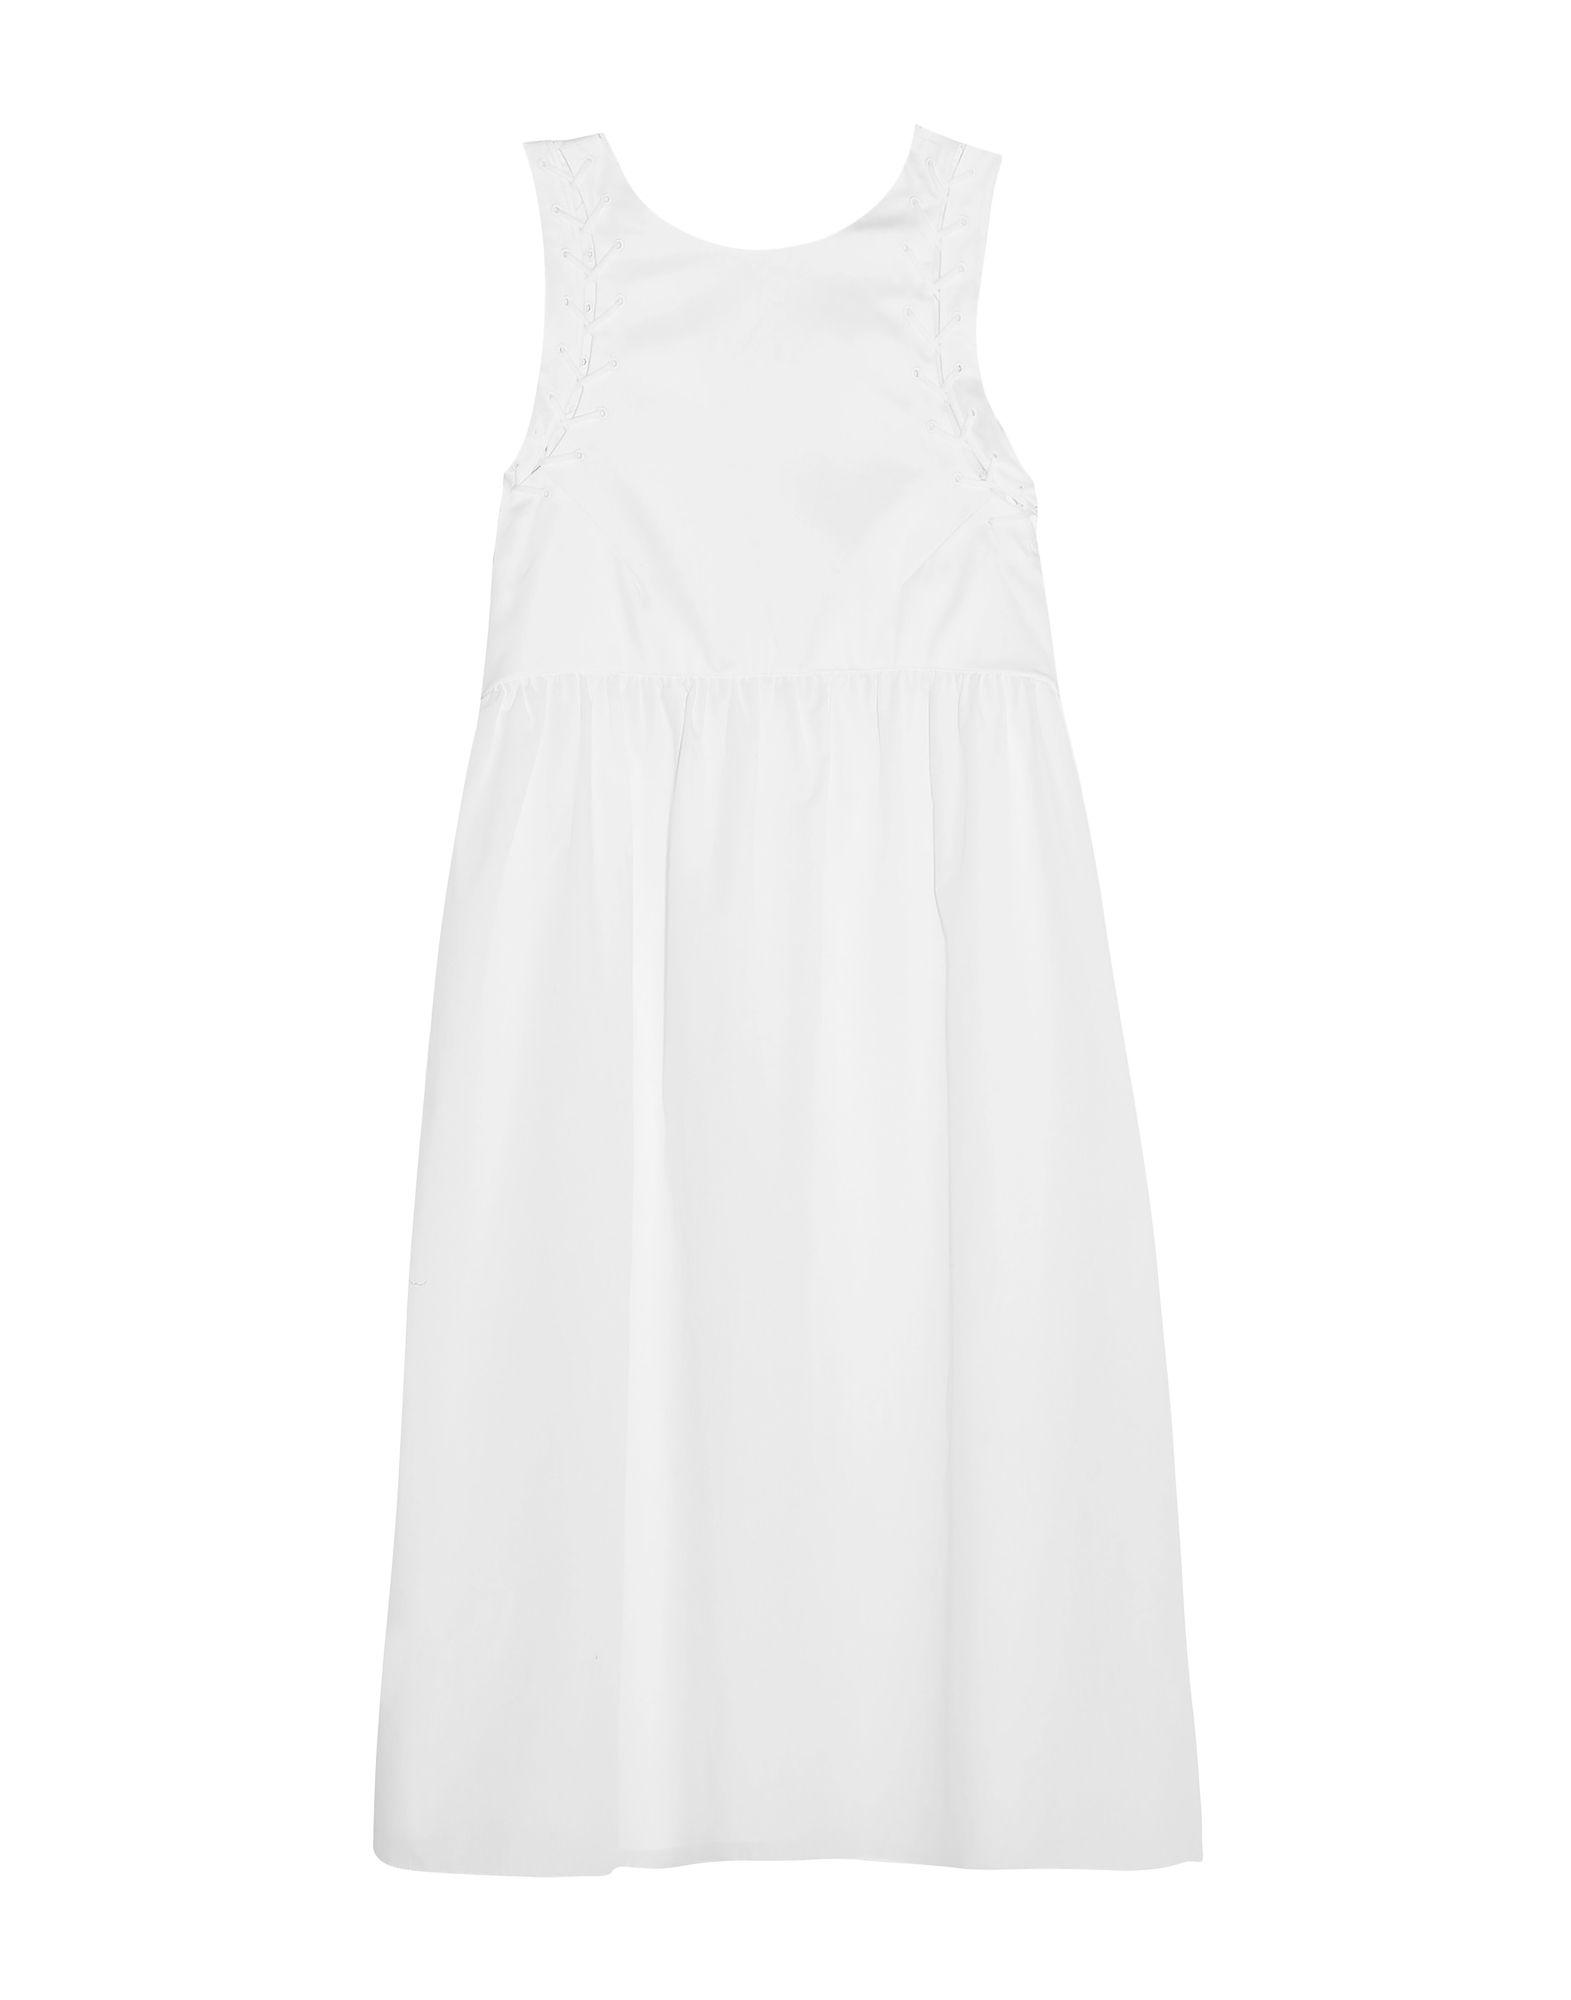 THREE GRACES LONDON Пляжное платье three graces london топ без рукавов